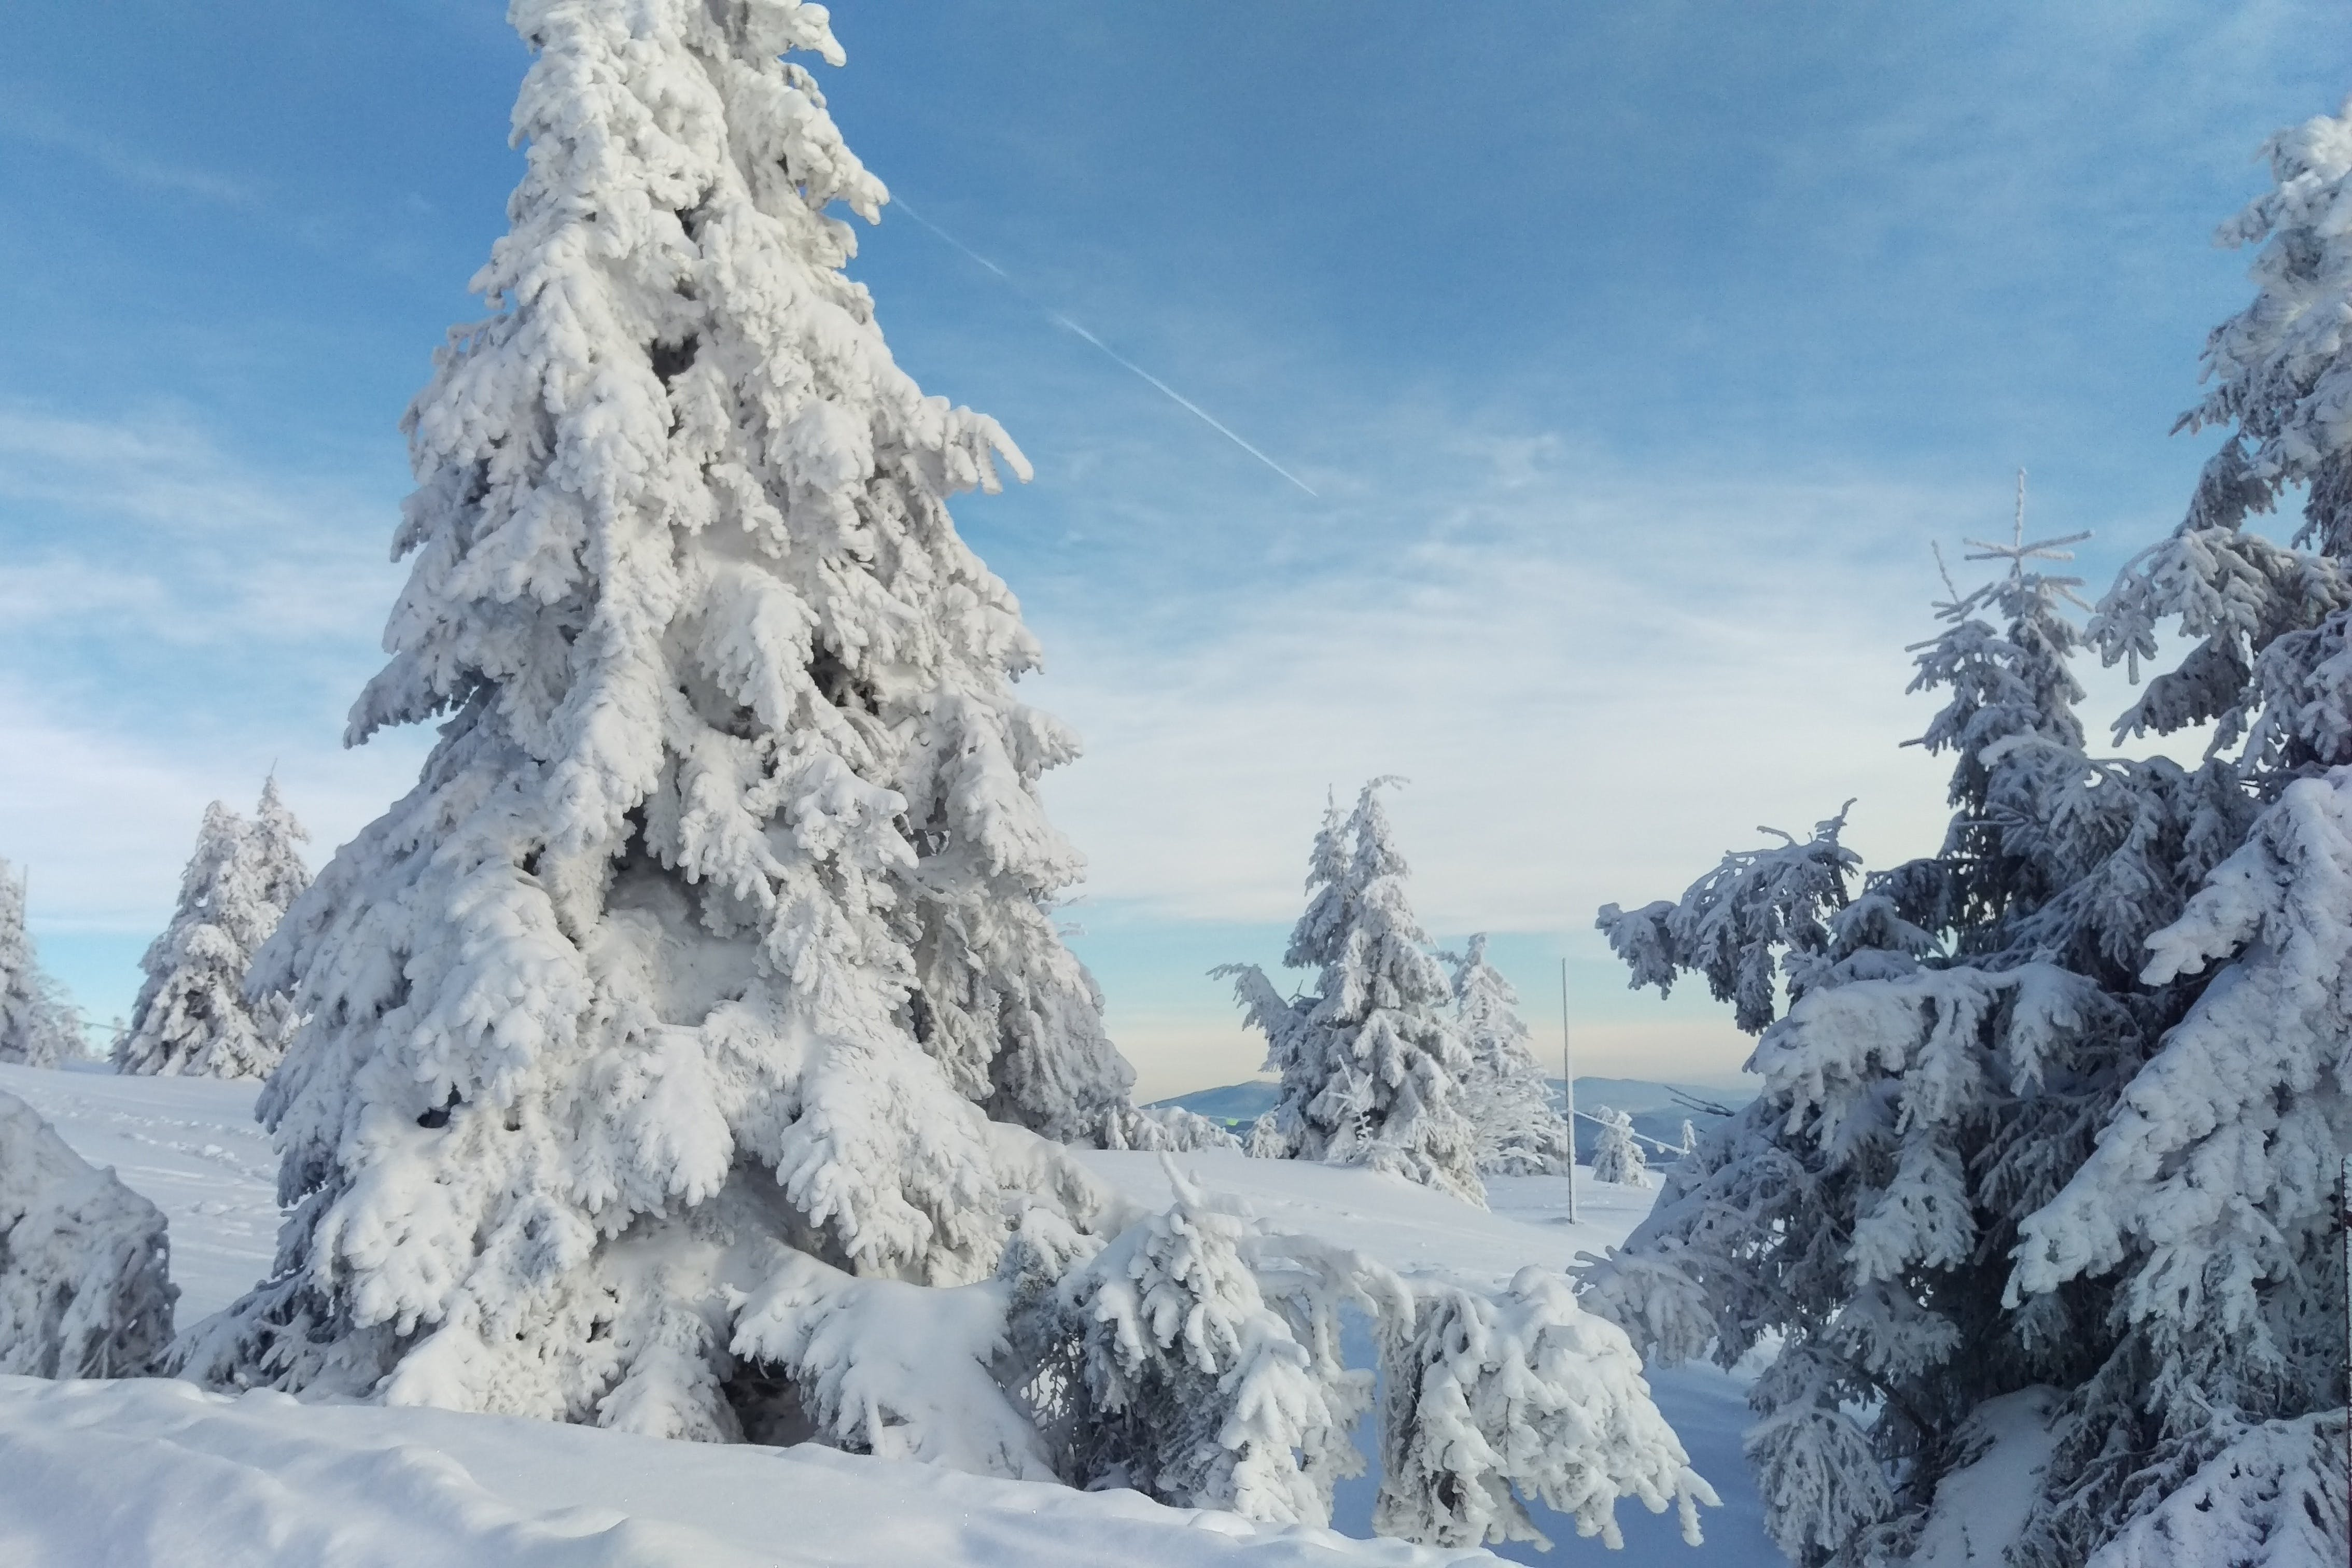 Fotos de stock gratuitas de arboles, azul, blanco, cielo azul